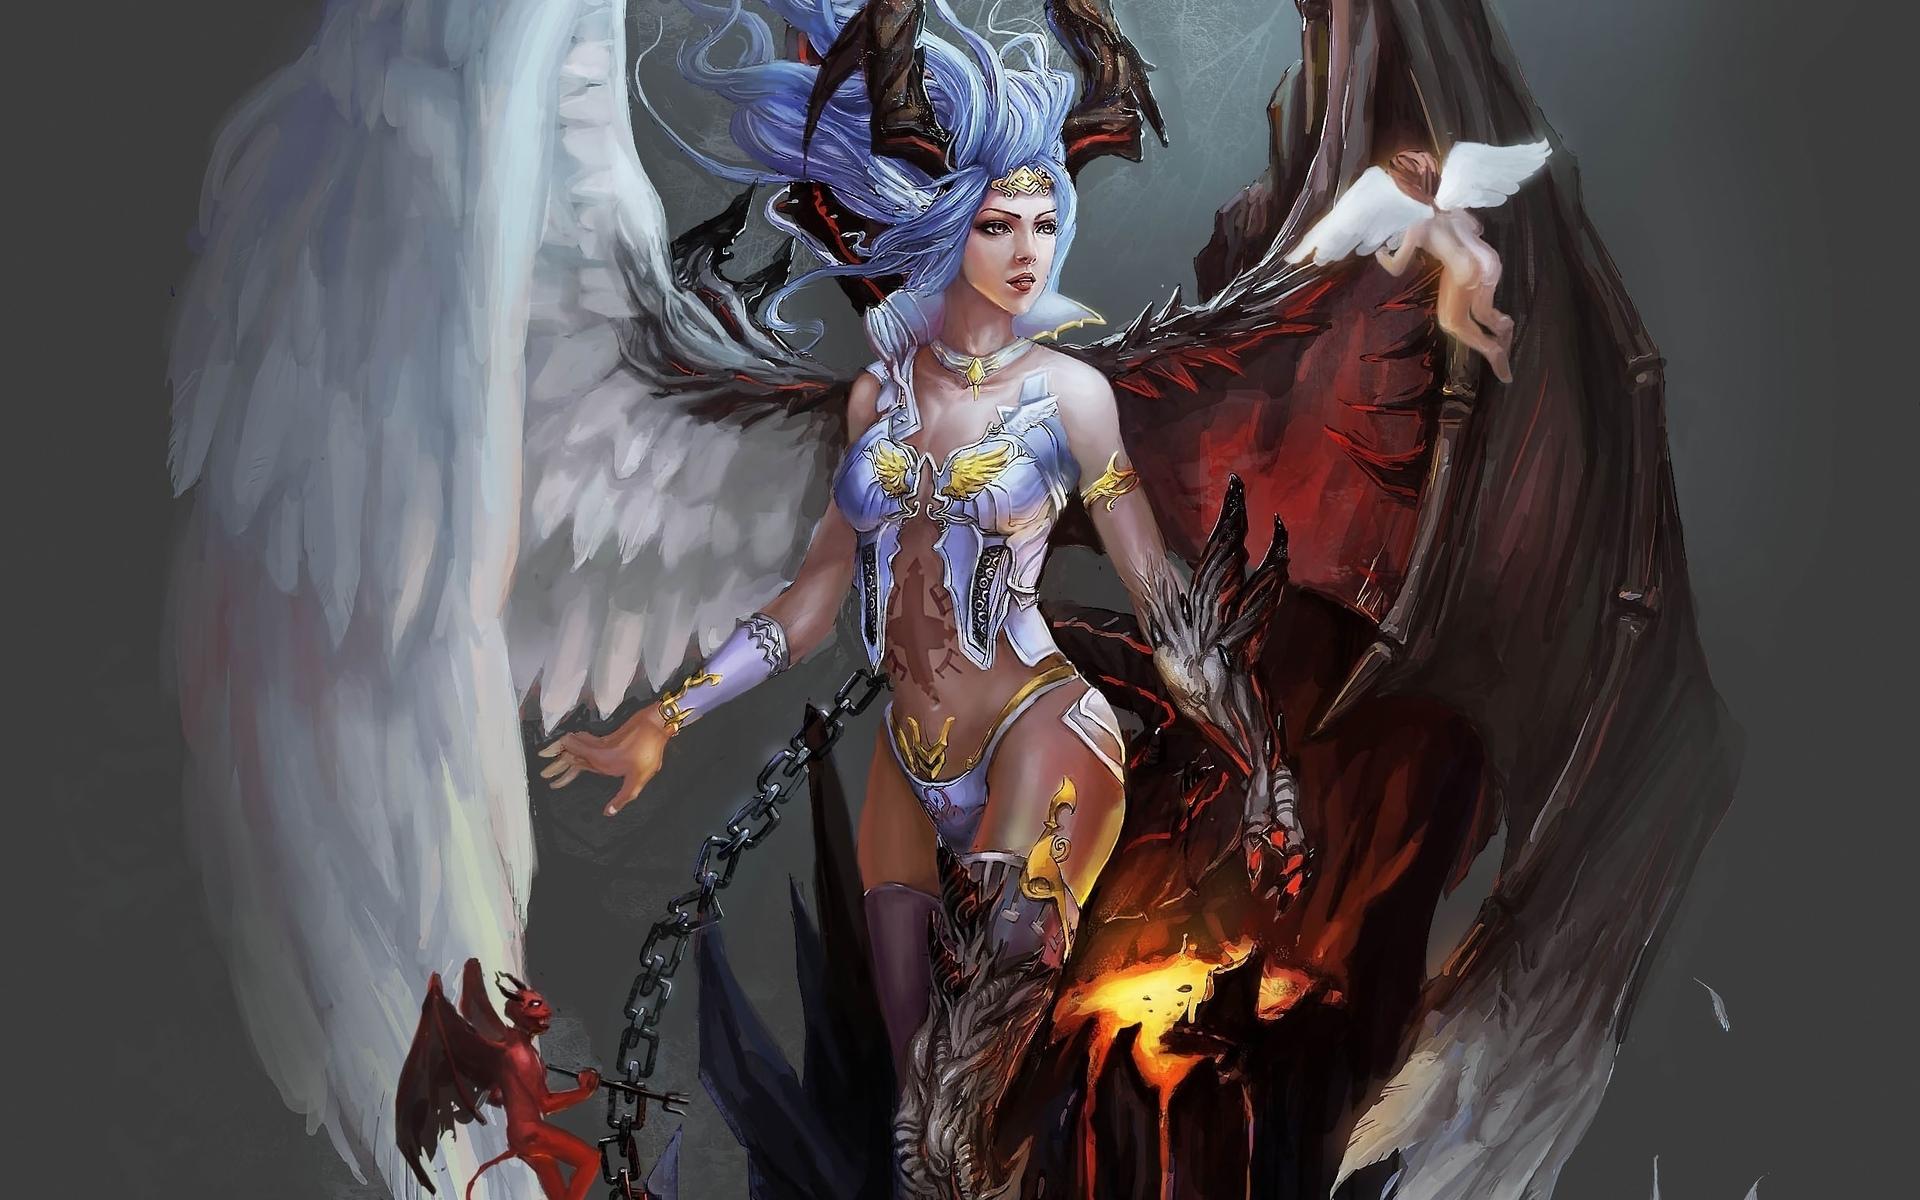 fantasy demon angel wings chains fire magic good evil god goddess art 1920x1200